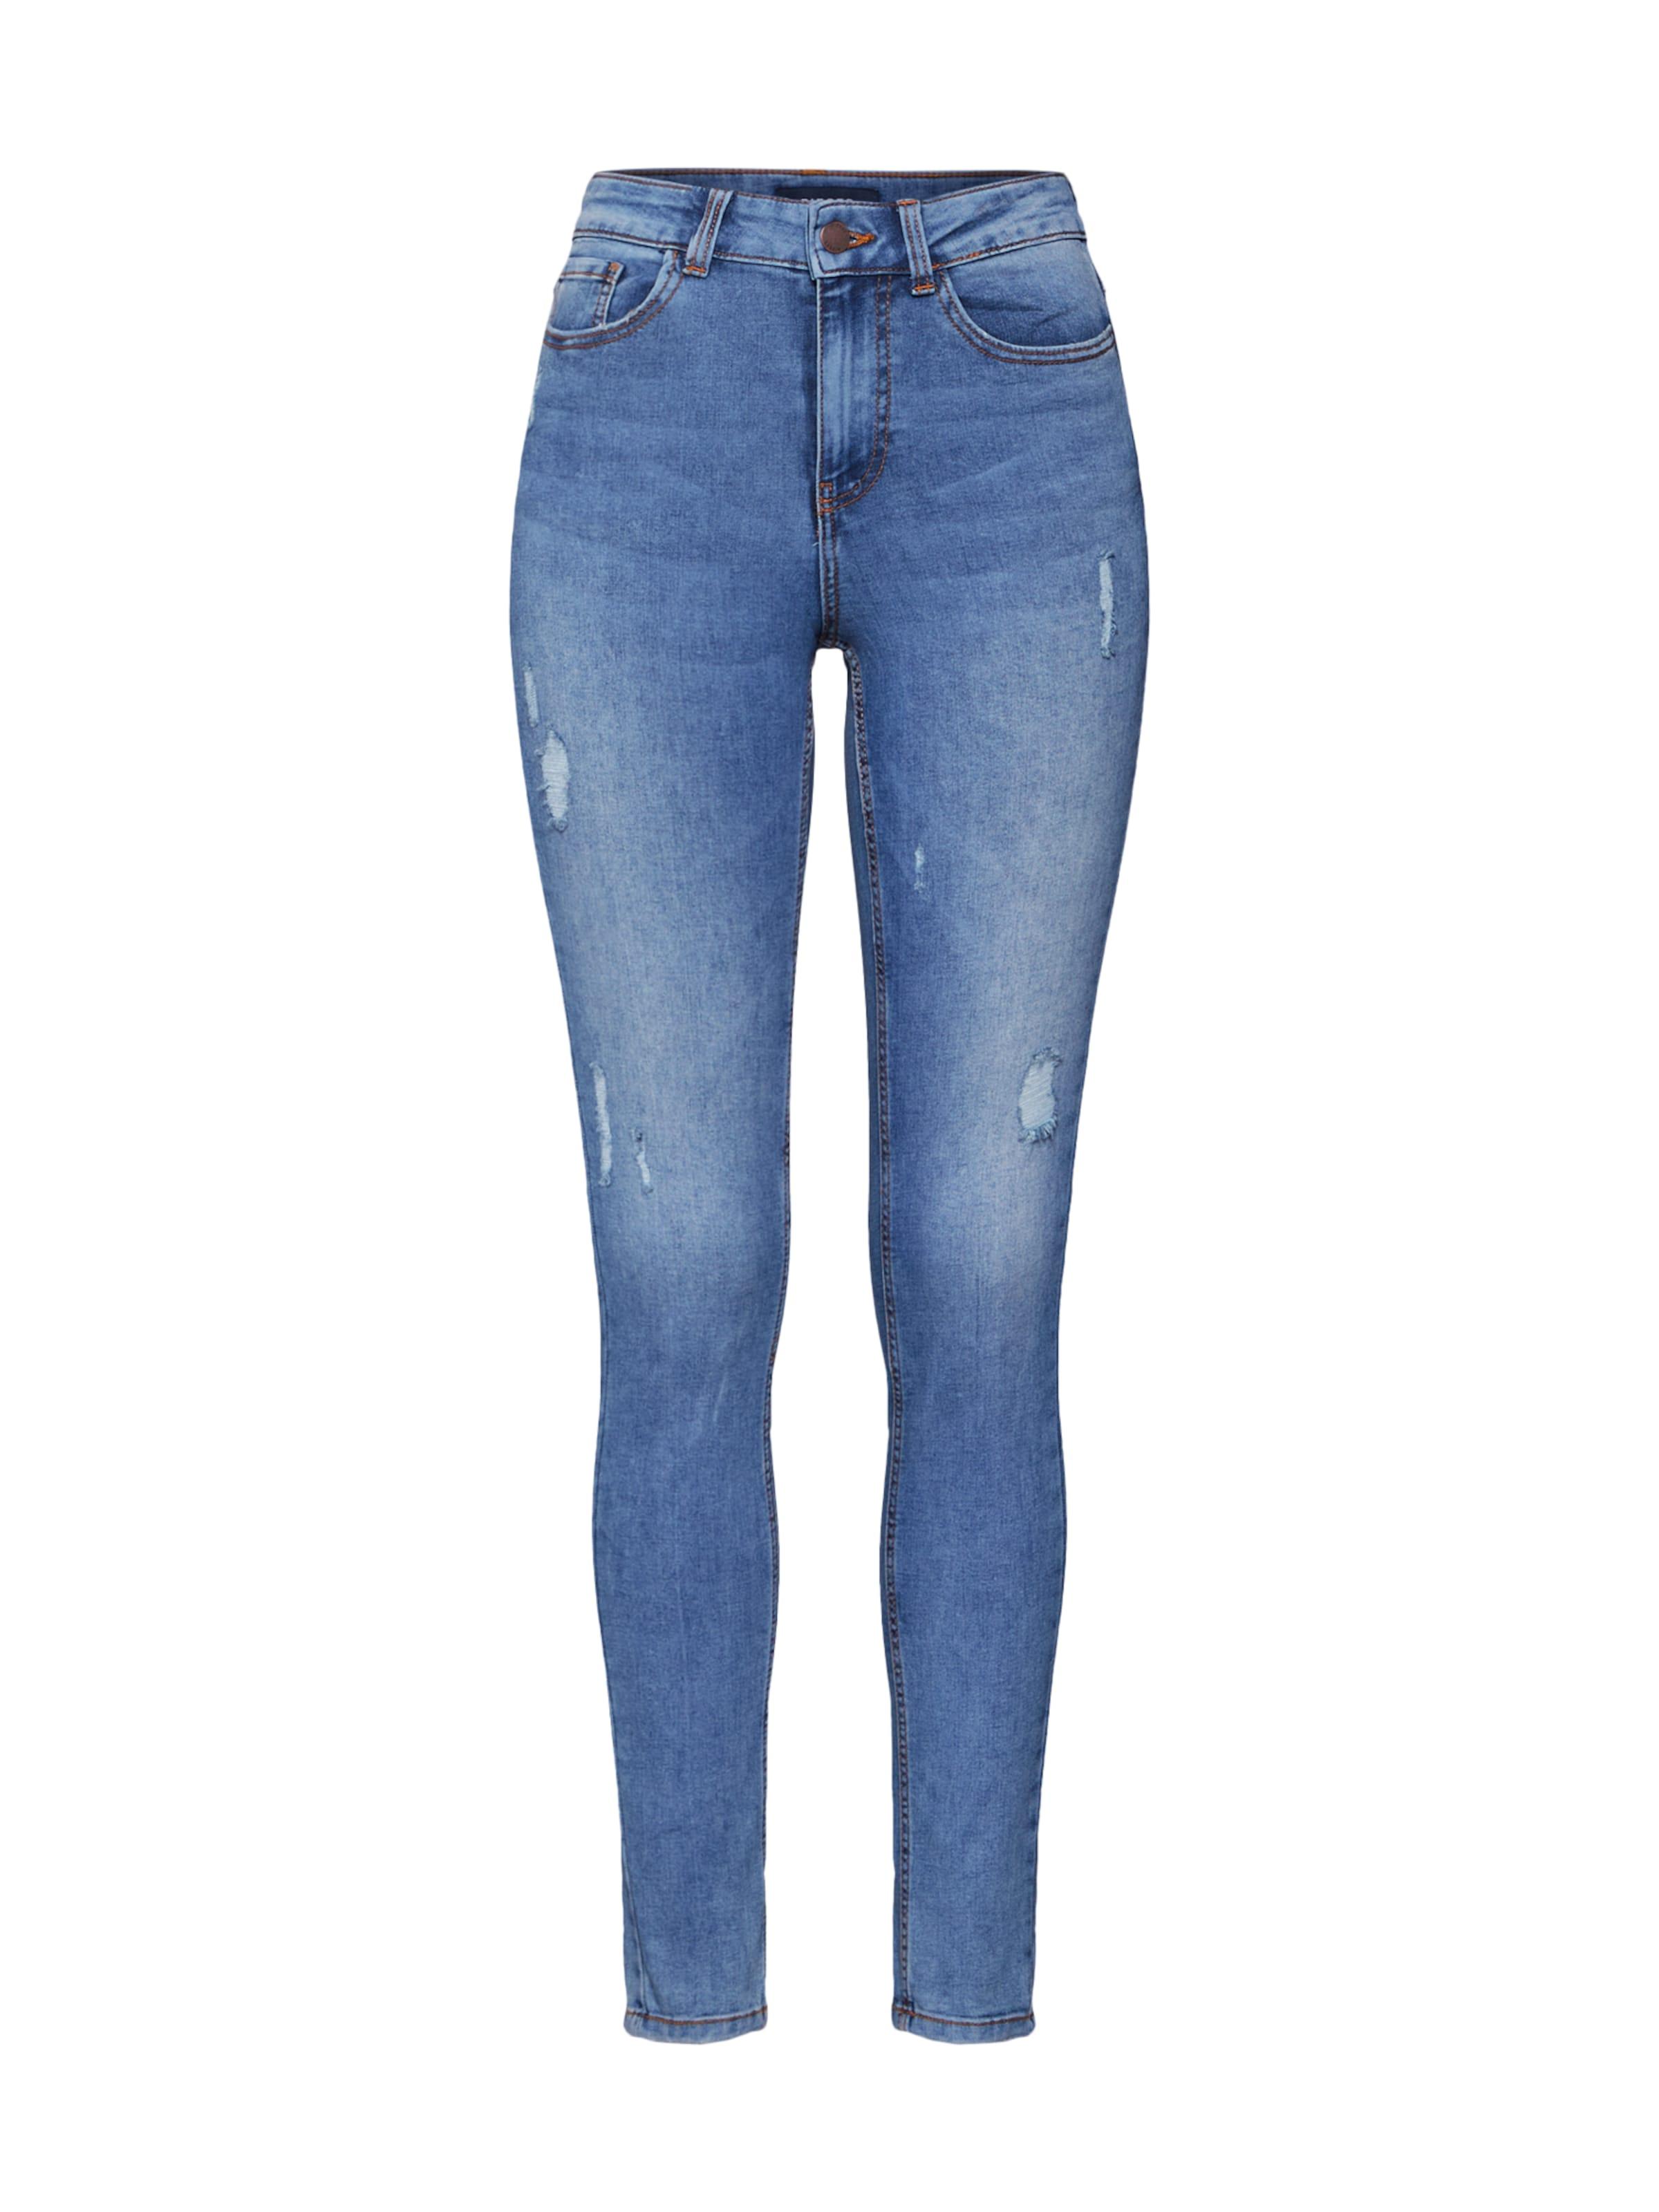 In Jeans Denim Blue Pieces QdCEerxBoW